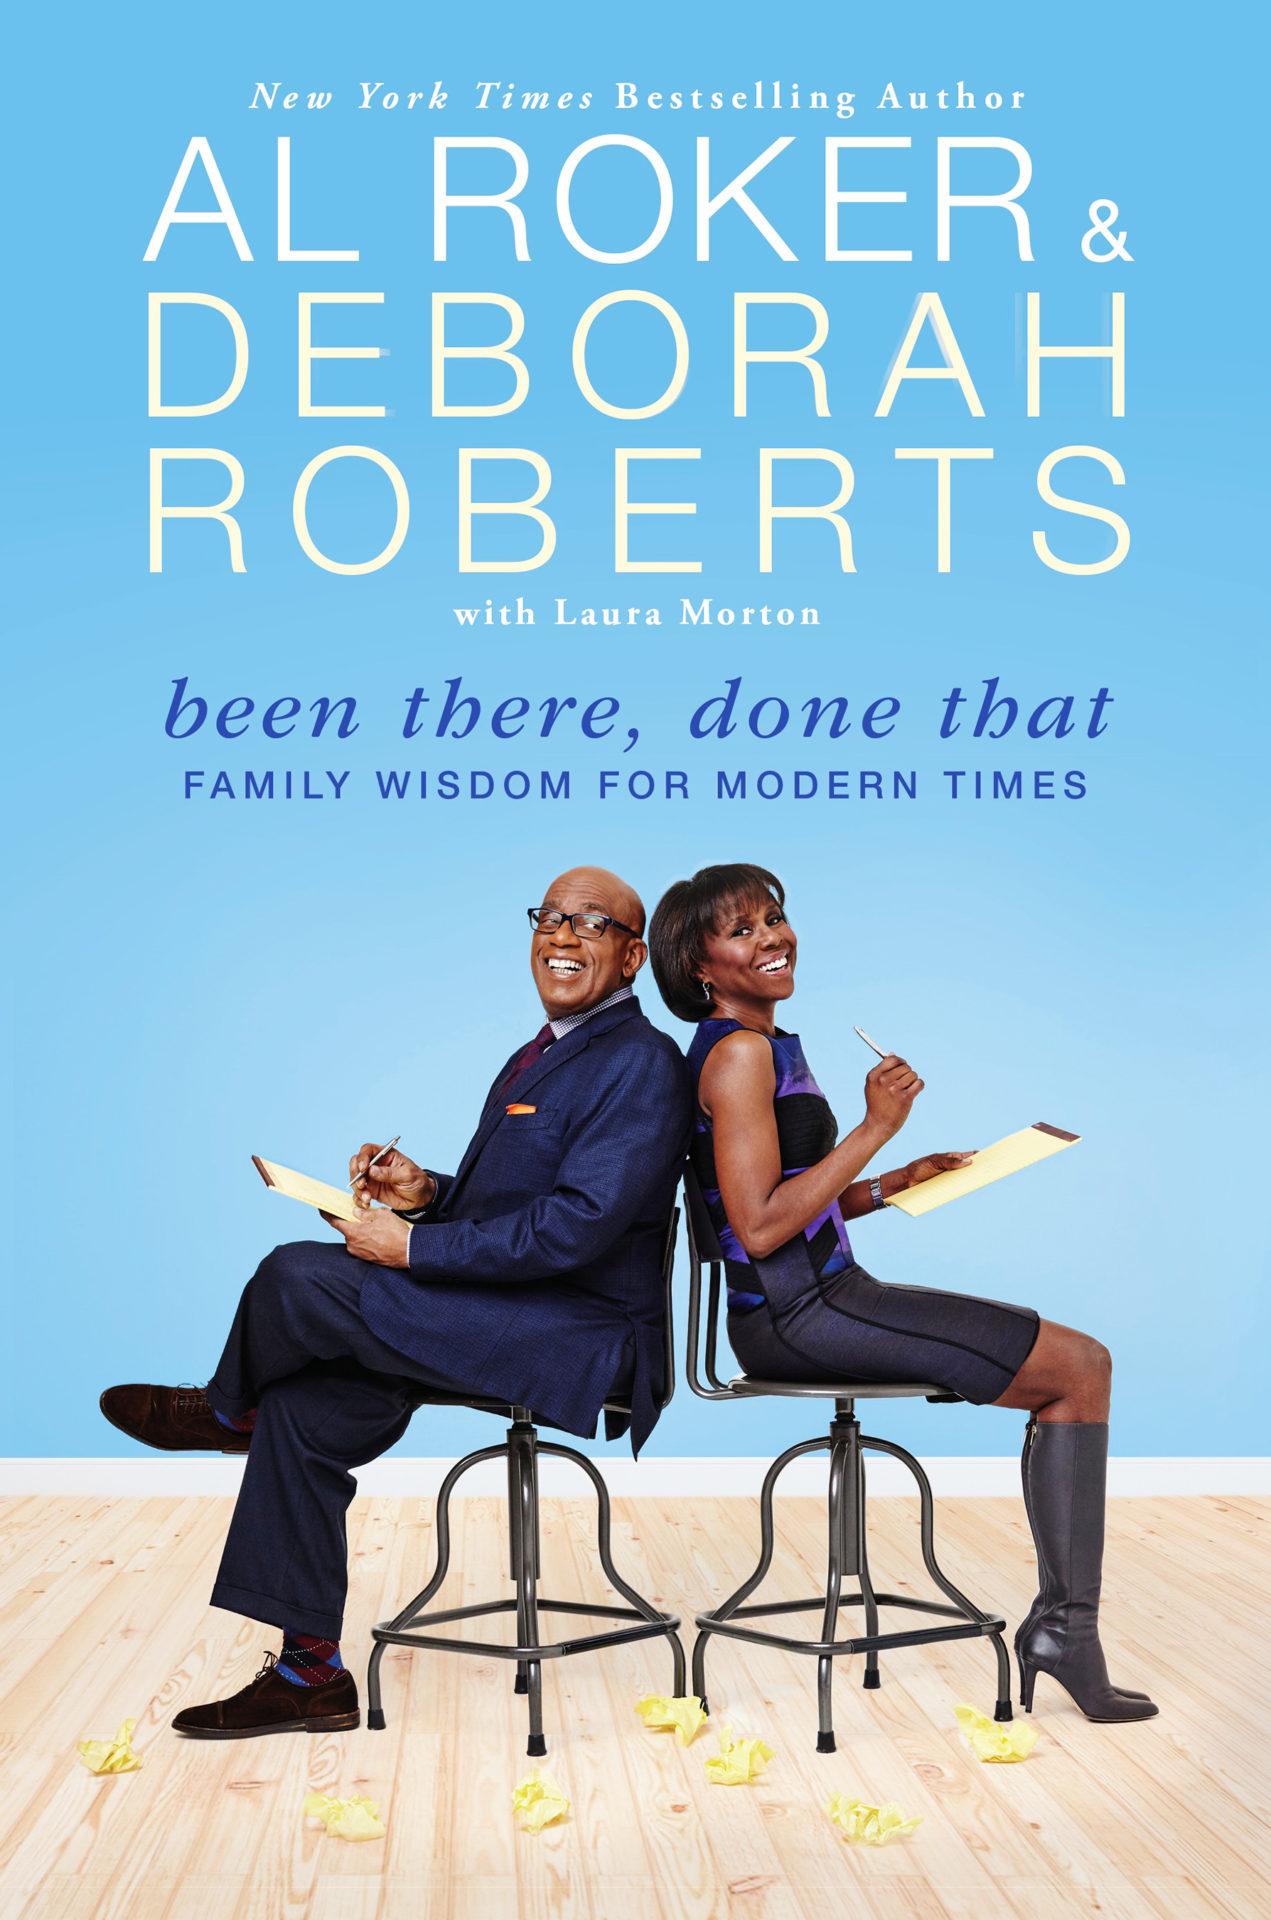 Al Rokor and Deborah Roberts